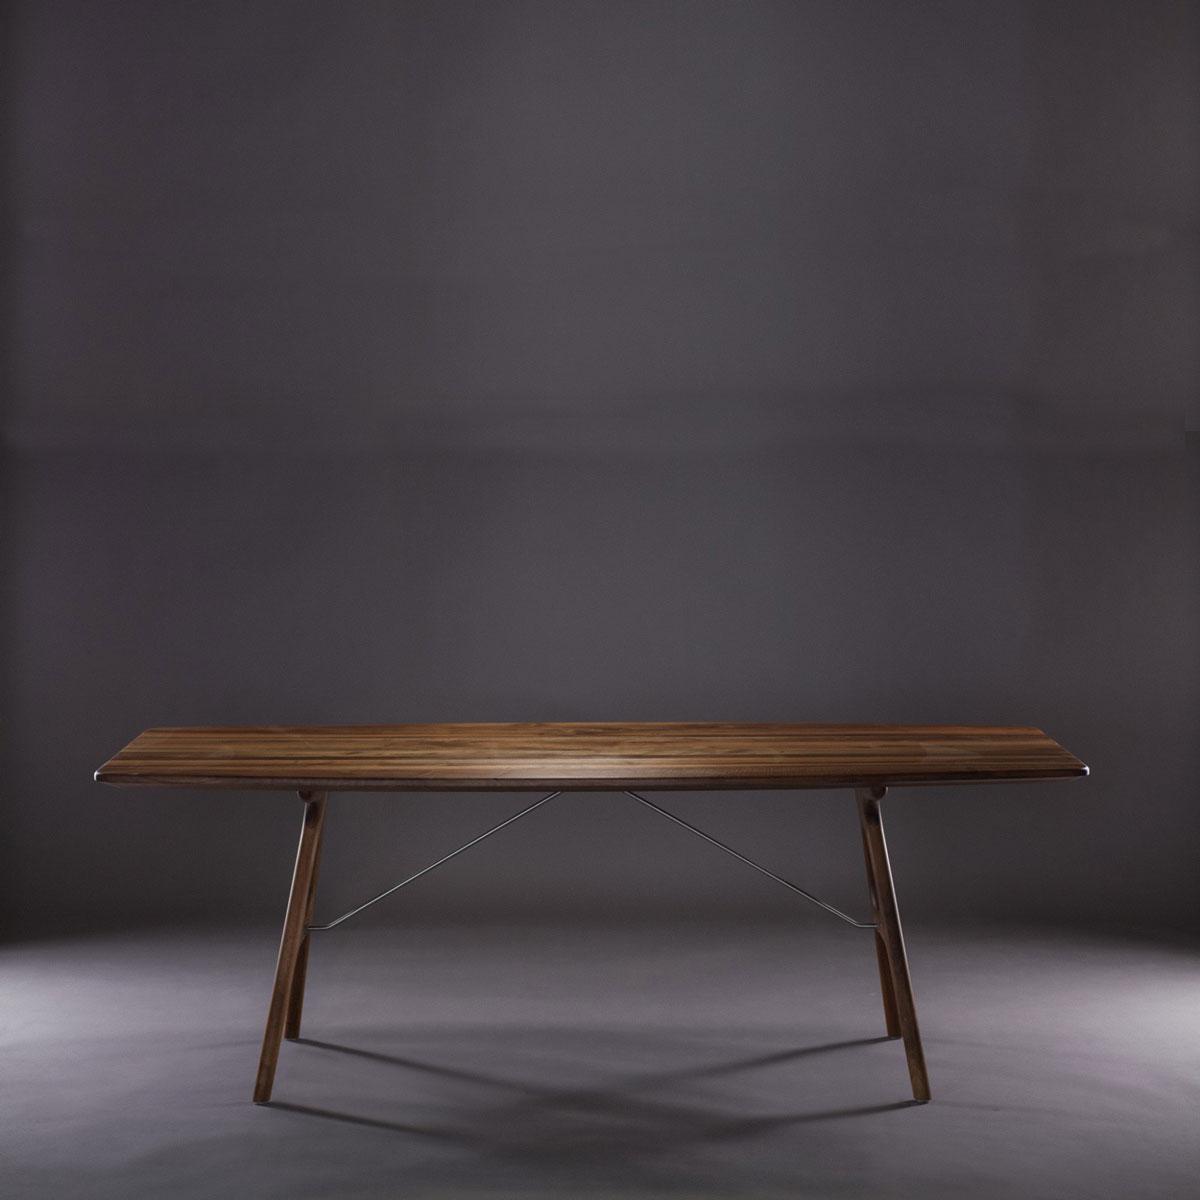 Mesa Tesa en madera maciza con posibilidad de extensión de 55 cm, diseño moderno y exclusivo para Artisan de Bosnia